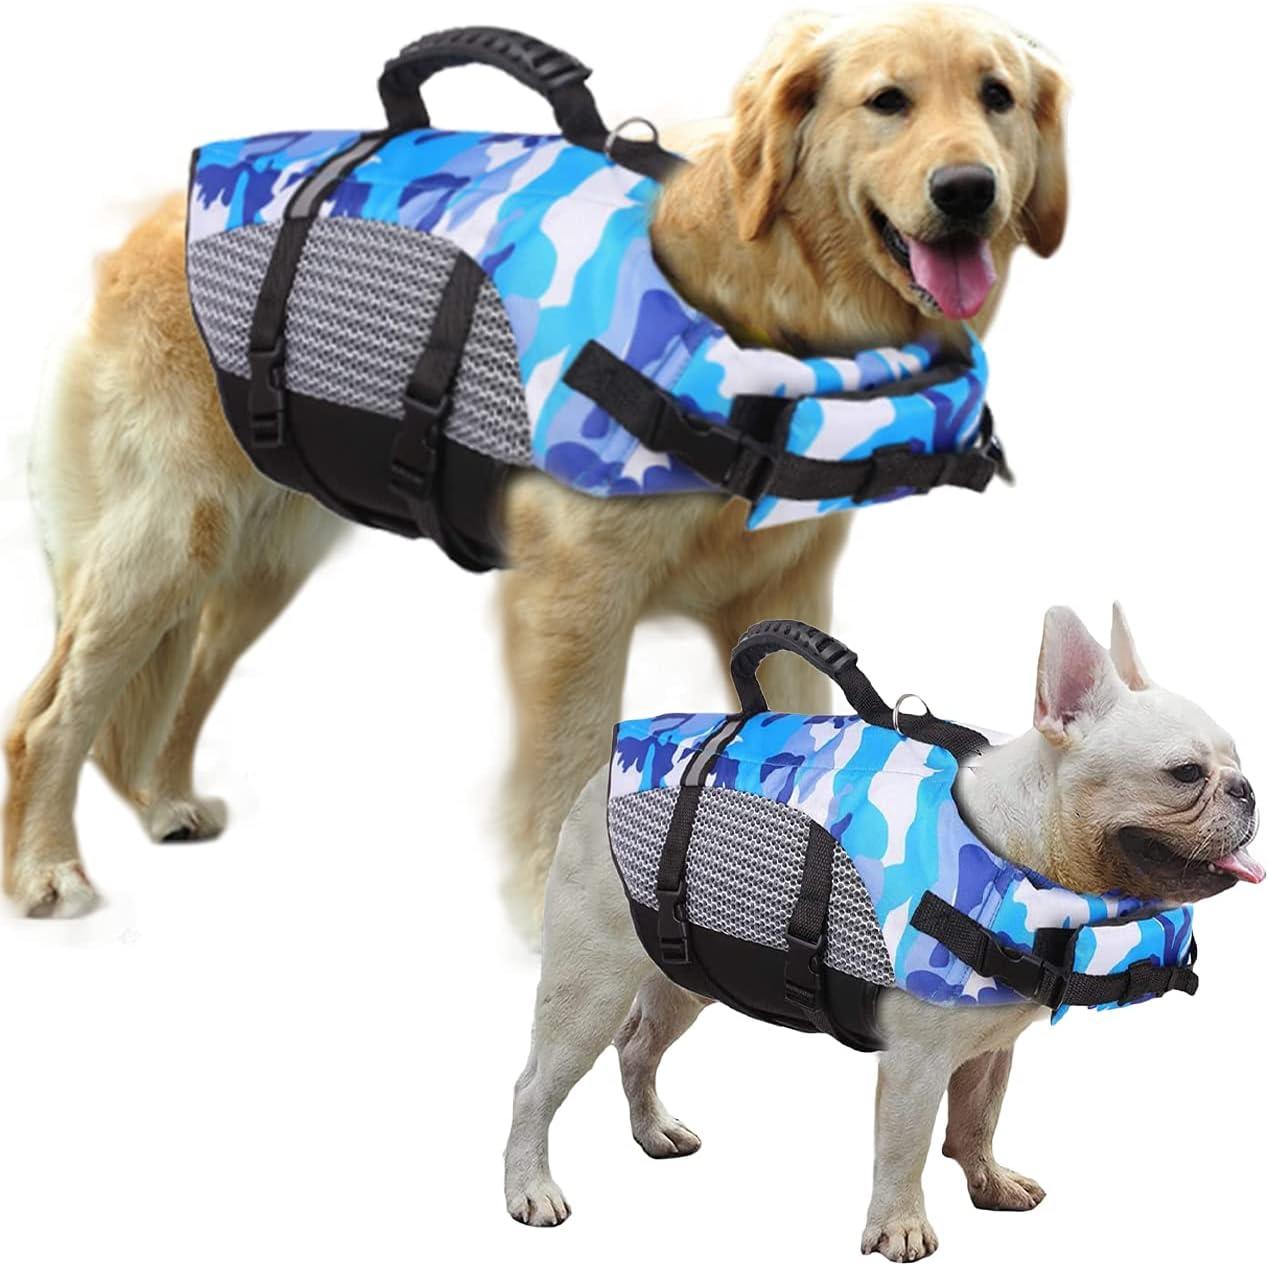 Huret Reflective Dog Denver Mall Life Jackets Pet Ripstop High quality new Vest Safety